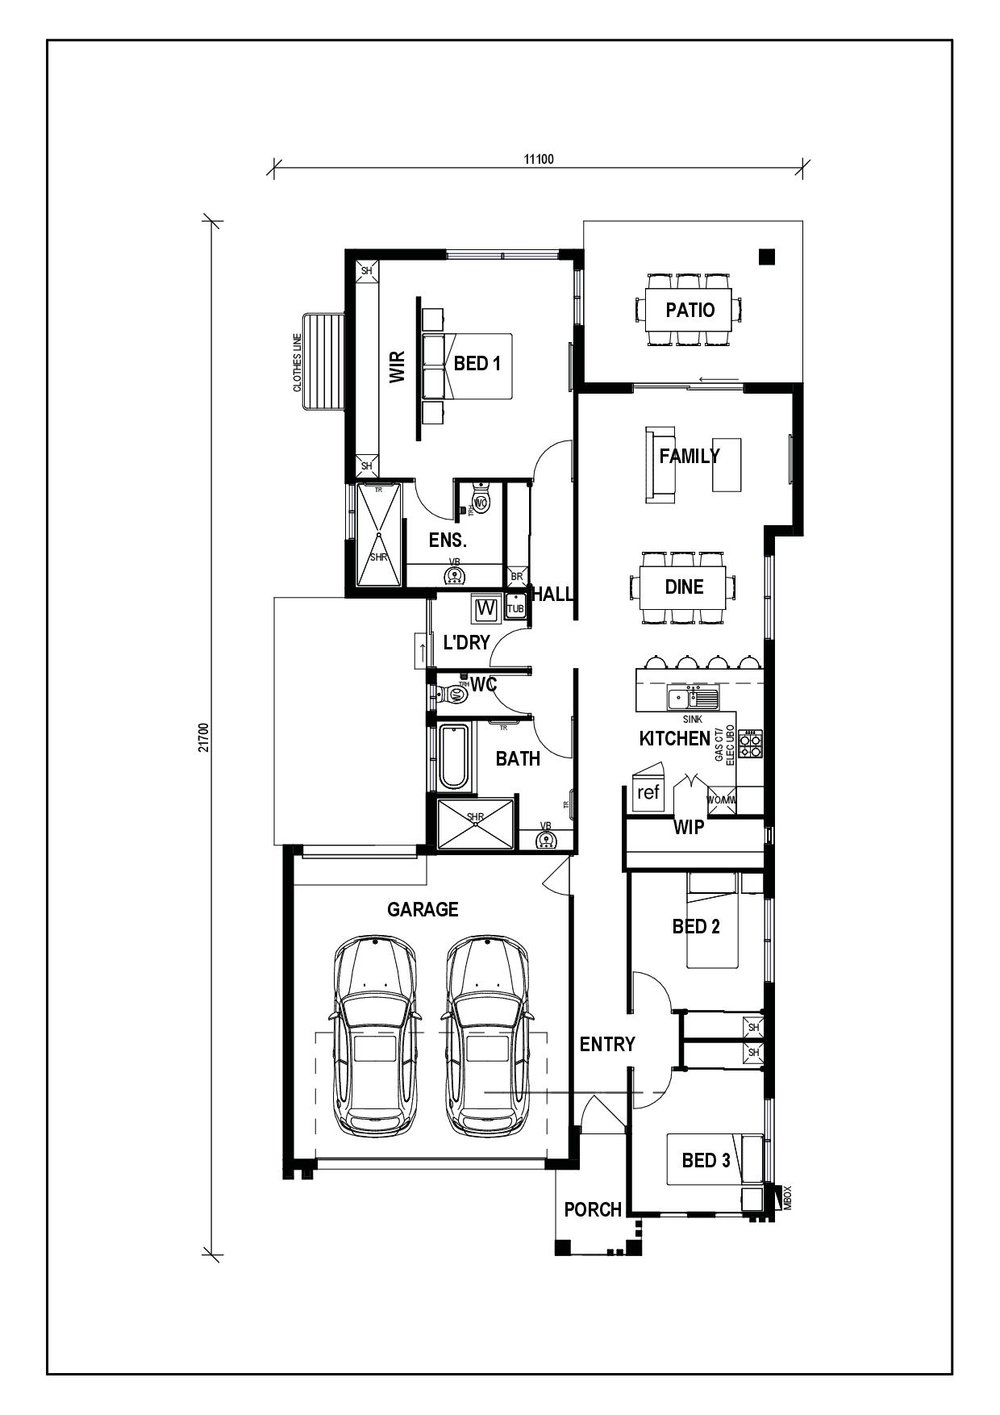 SAHARA B Floor Plans.jpg